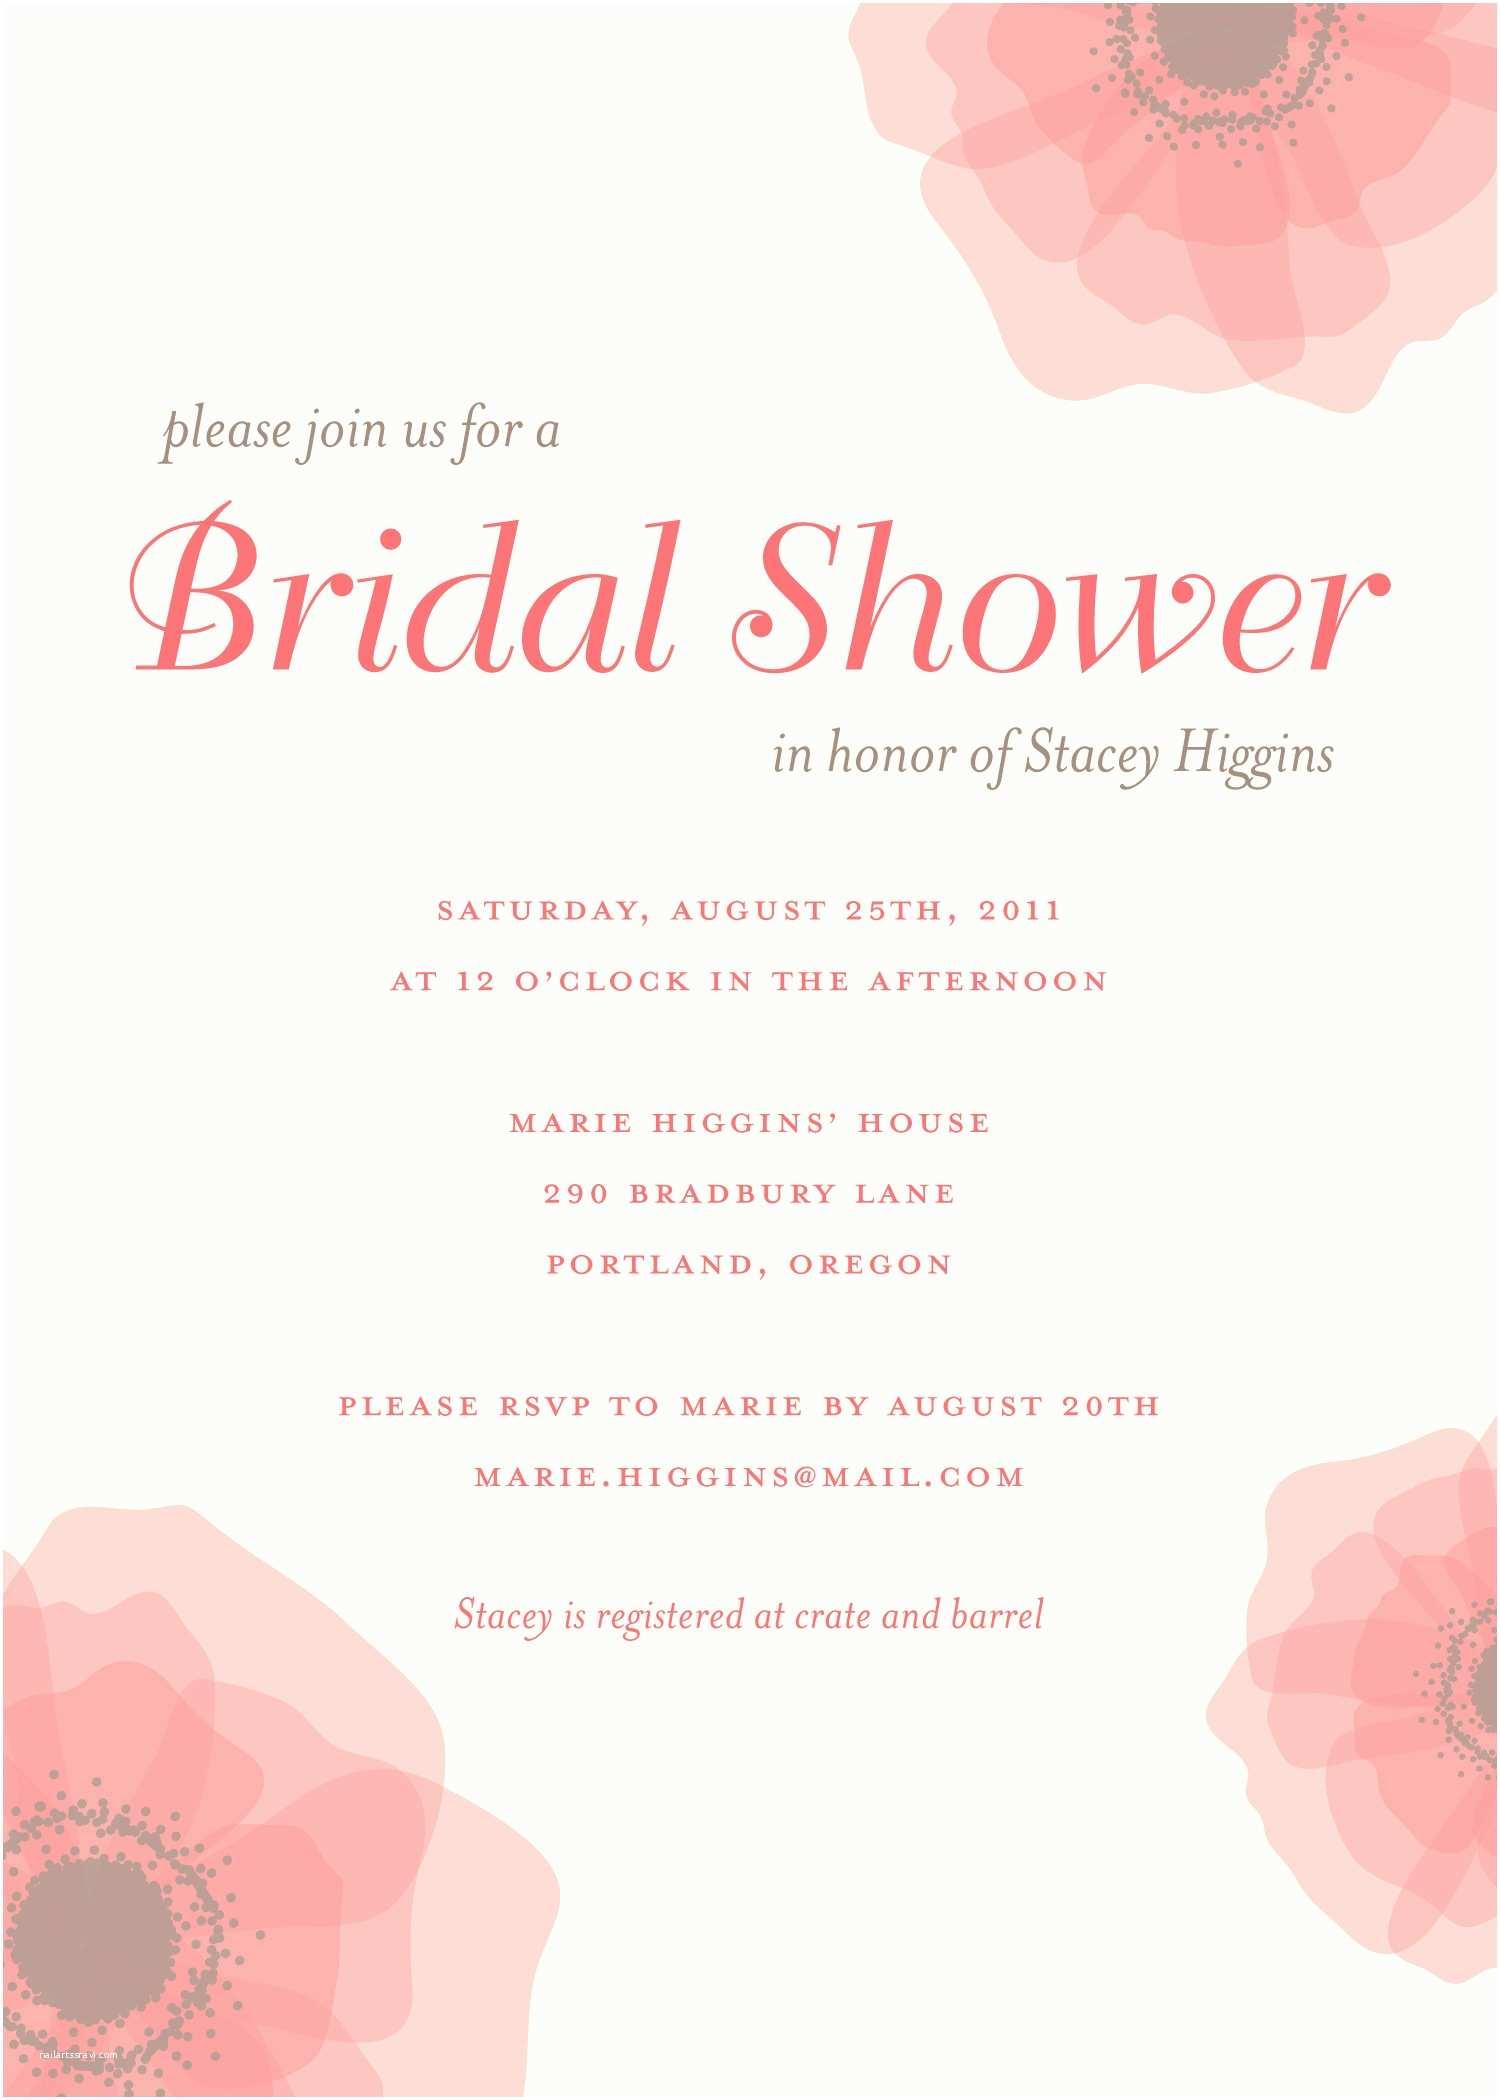 Bridal Shower Invitation Templates Bridal Shower Invitations Wedzu Image